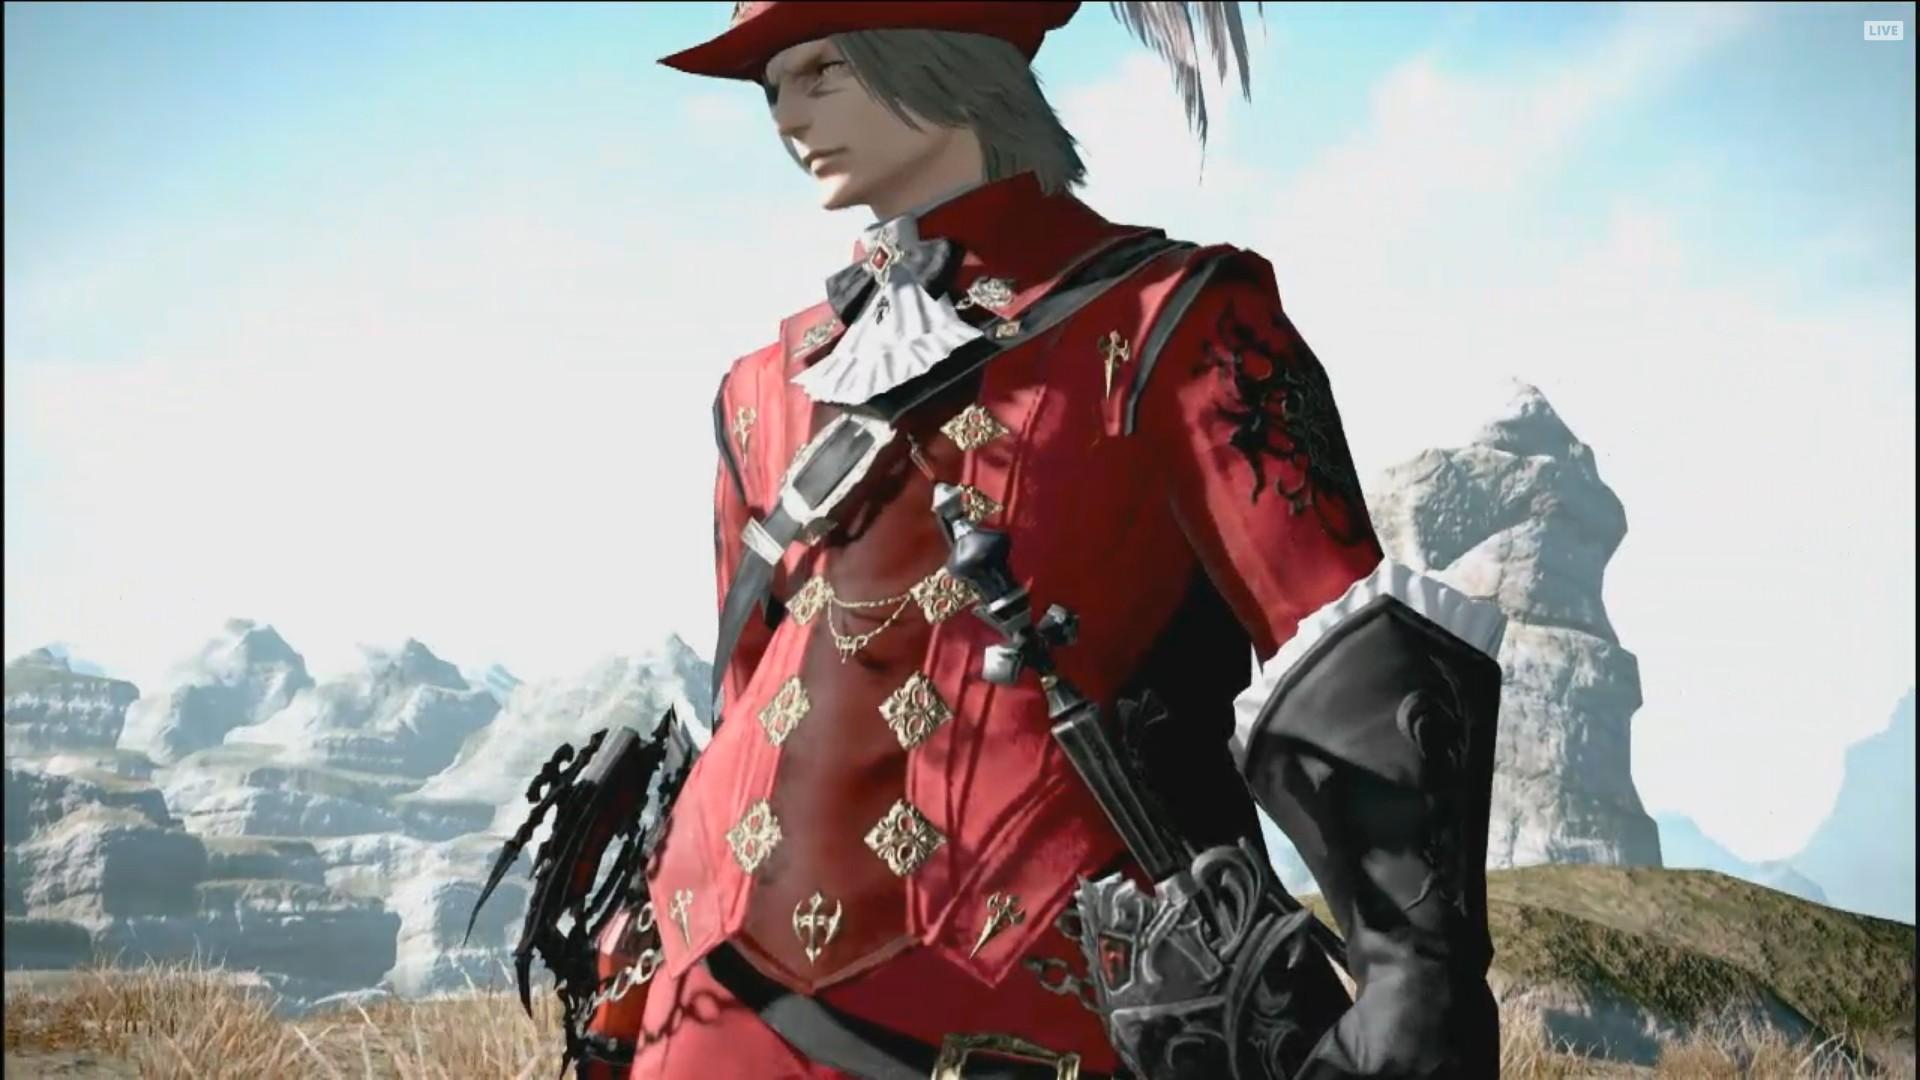 Final Fantasy XIV: Stormblood bringt neue Klasse Red Mage – Release-Datum bekannt